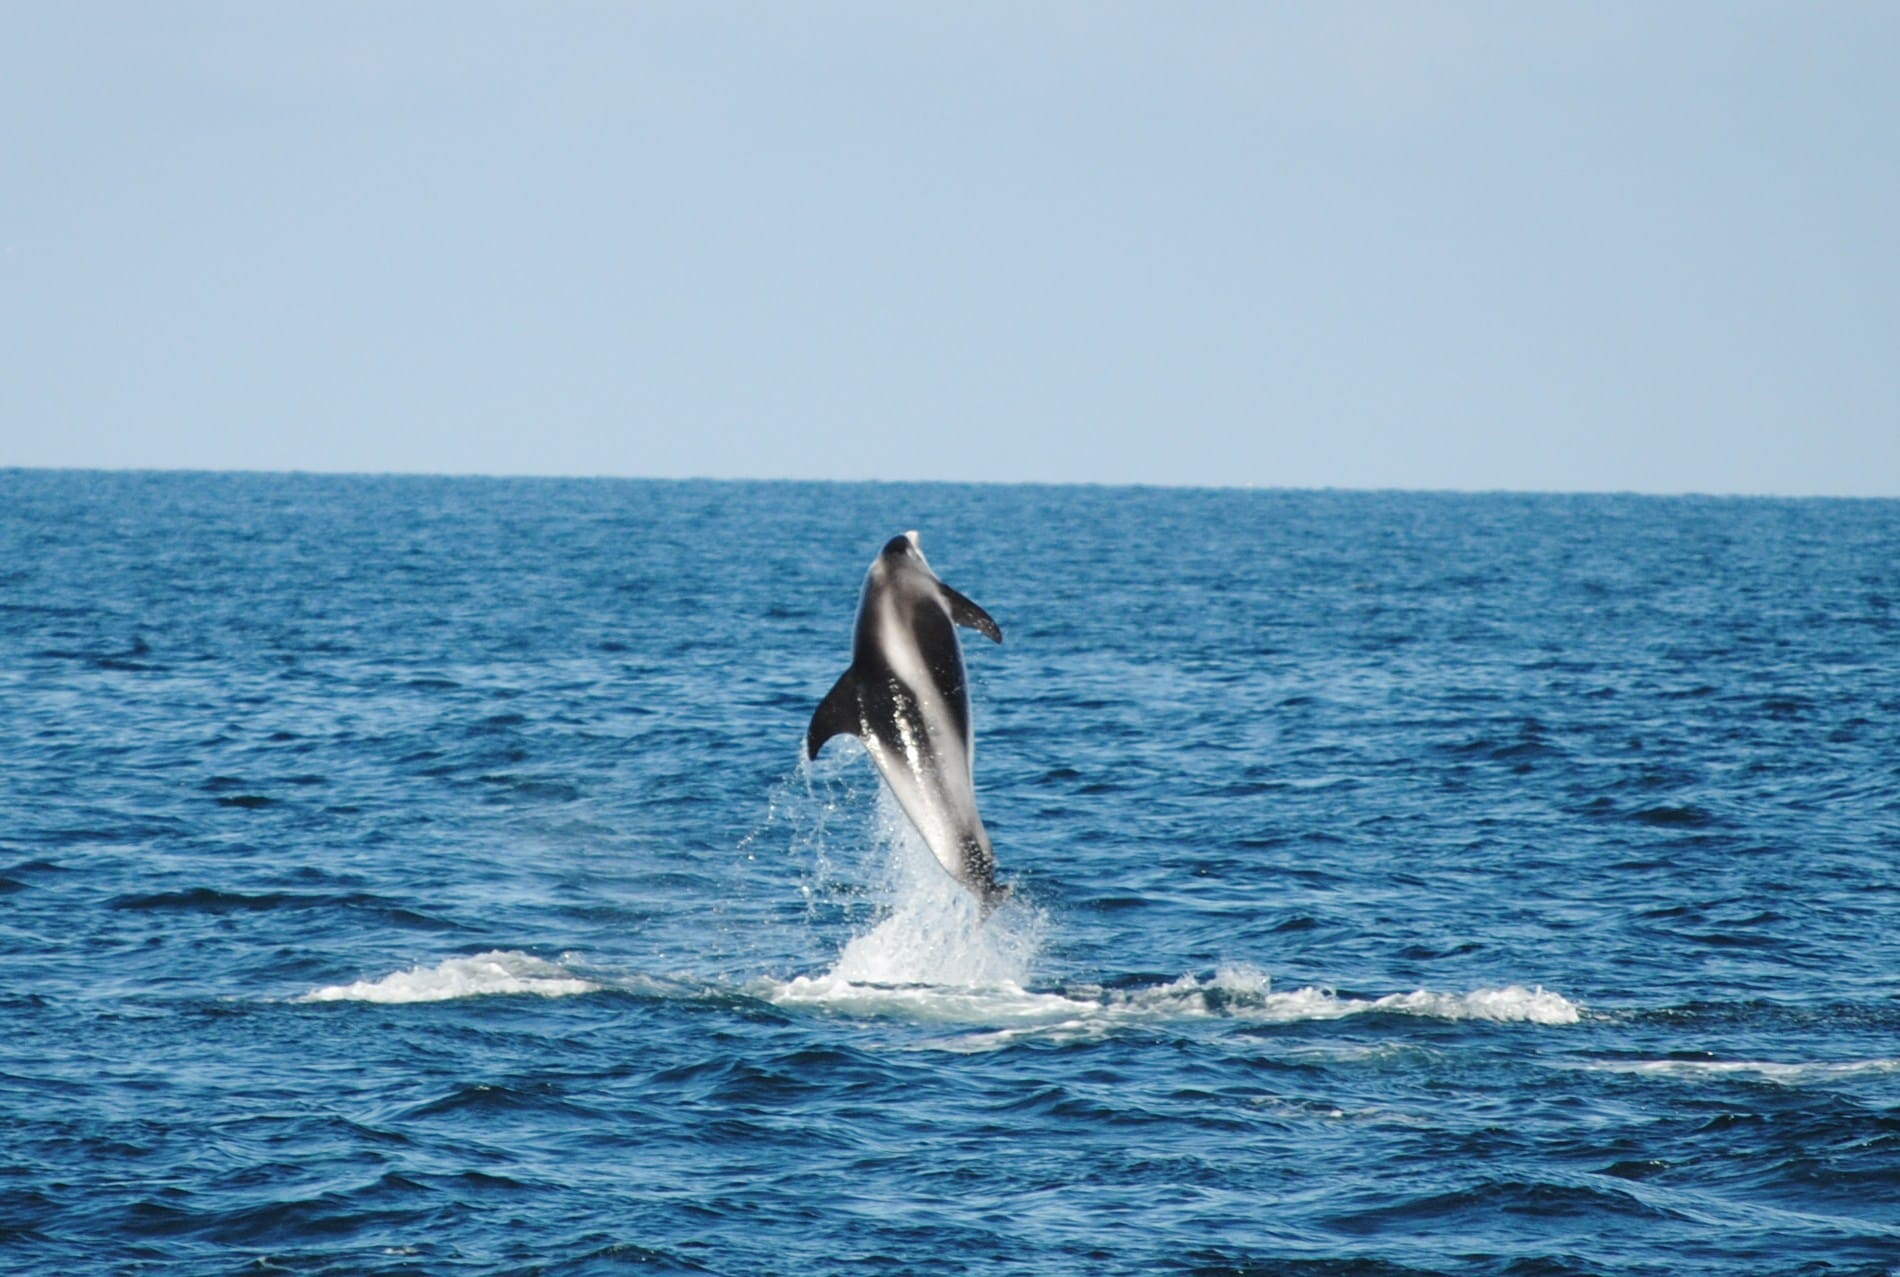 Witsnuitdolfijn jumping